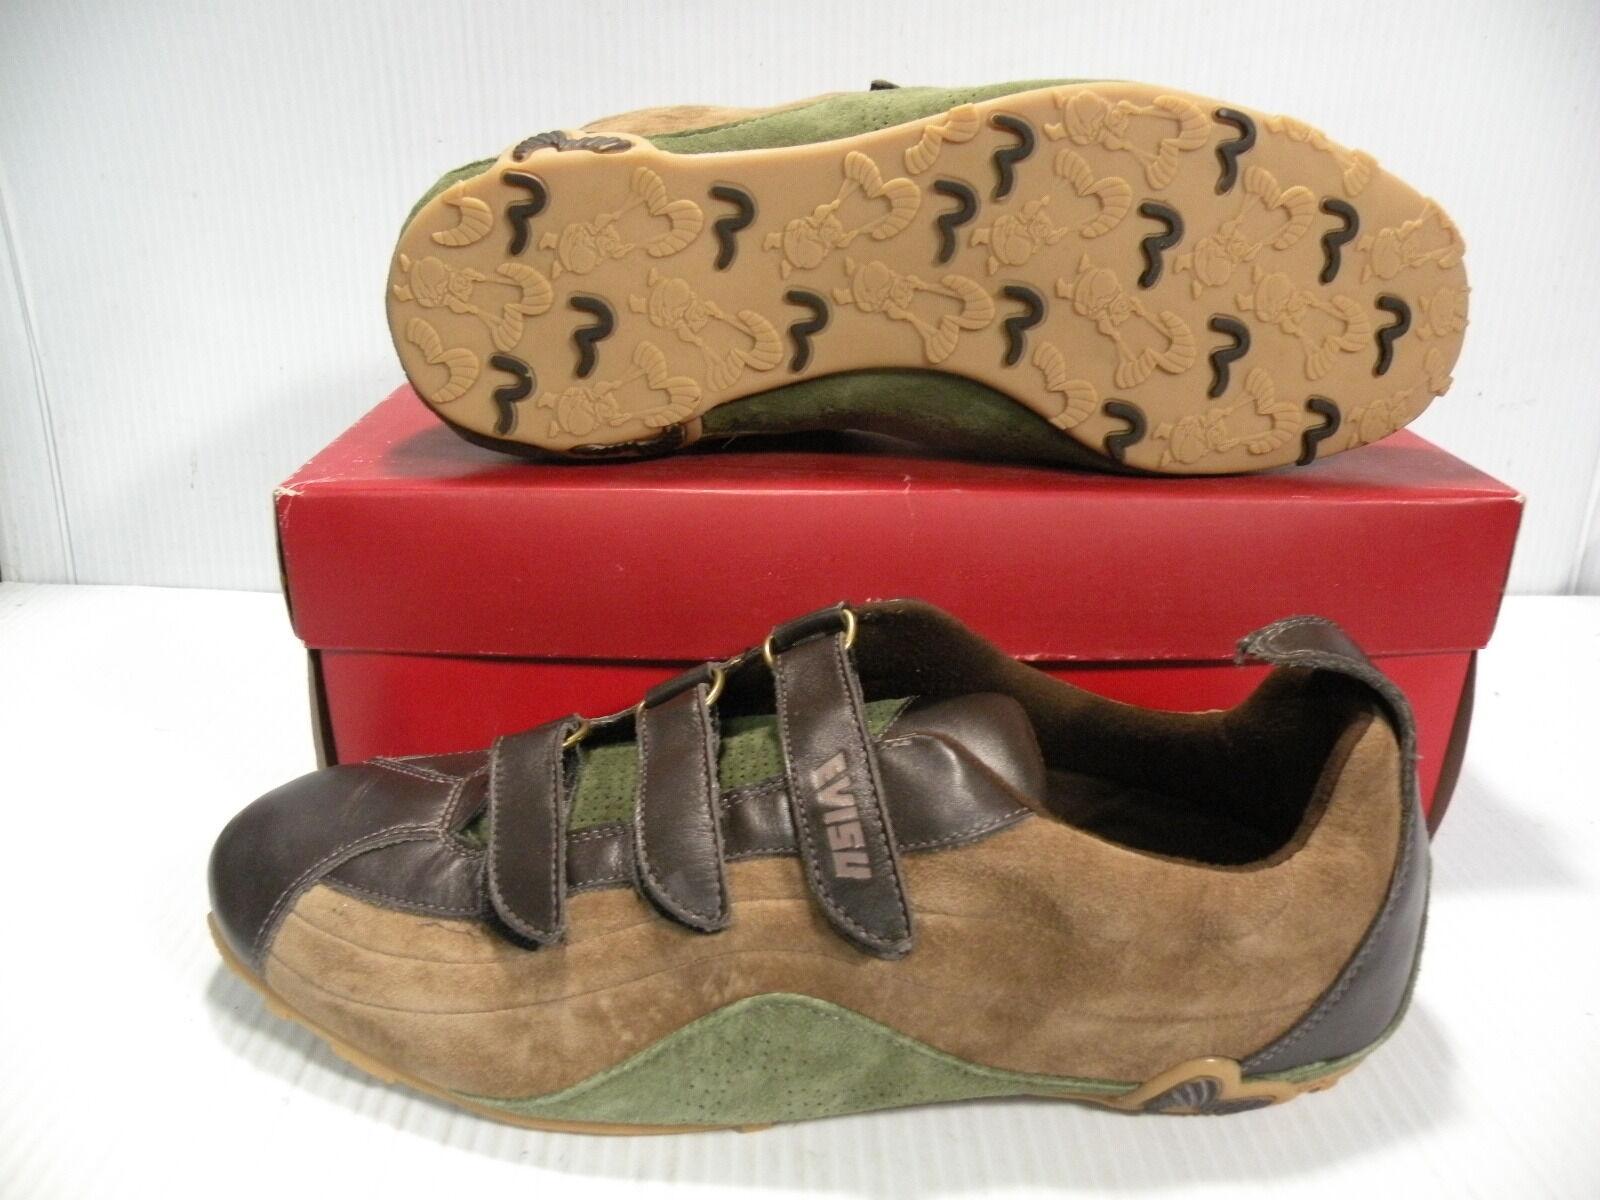 EVISU SHIKO BROWIZ LOW Baskethommes Chaussures BROWIZ SHIKO 2f352f